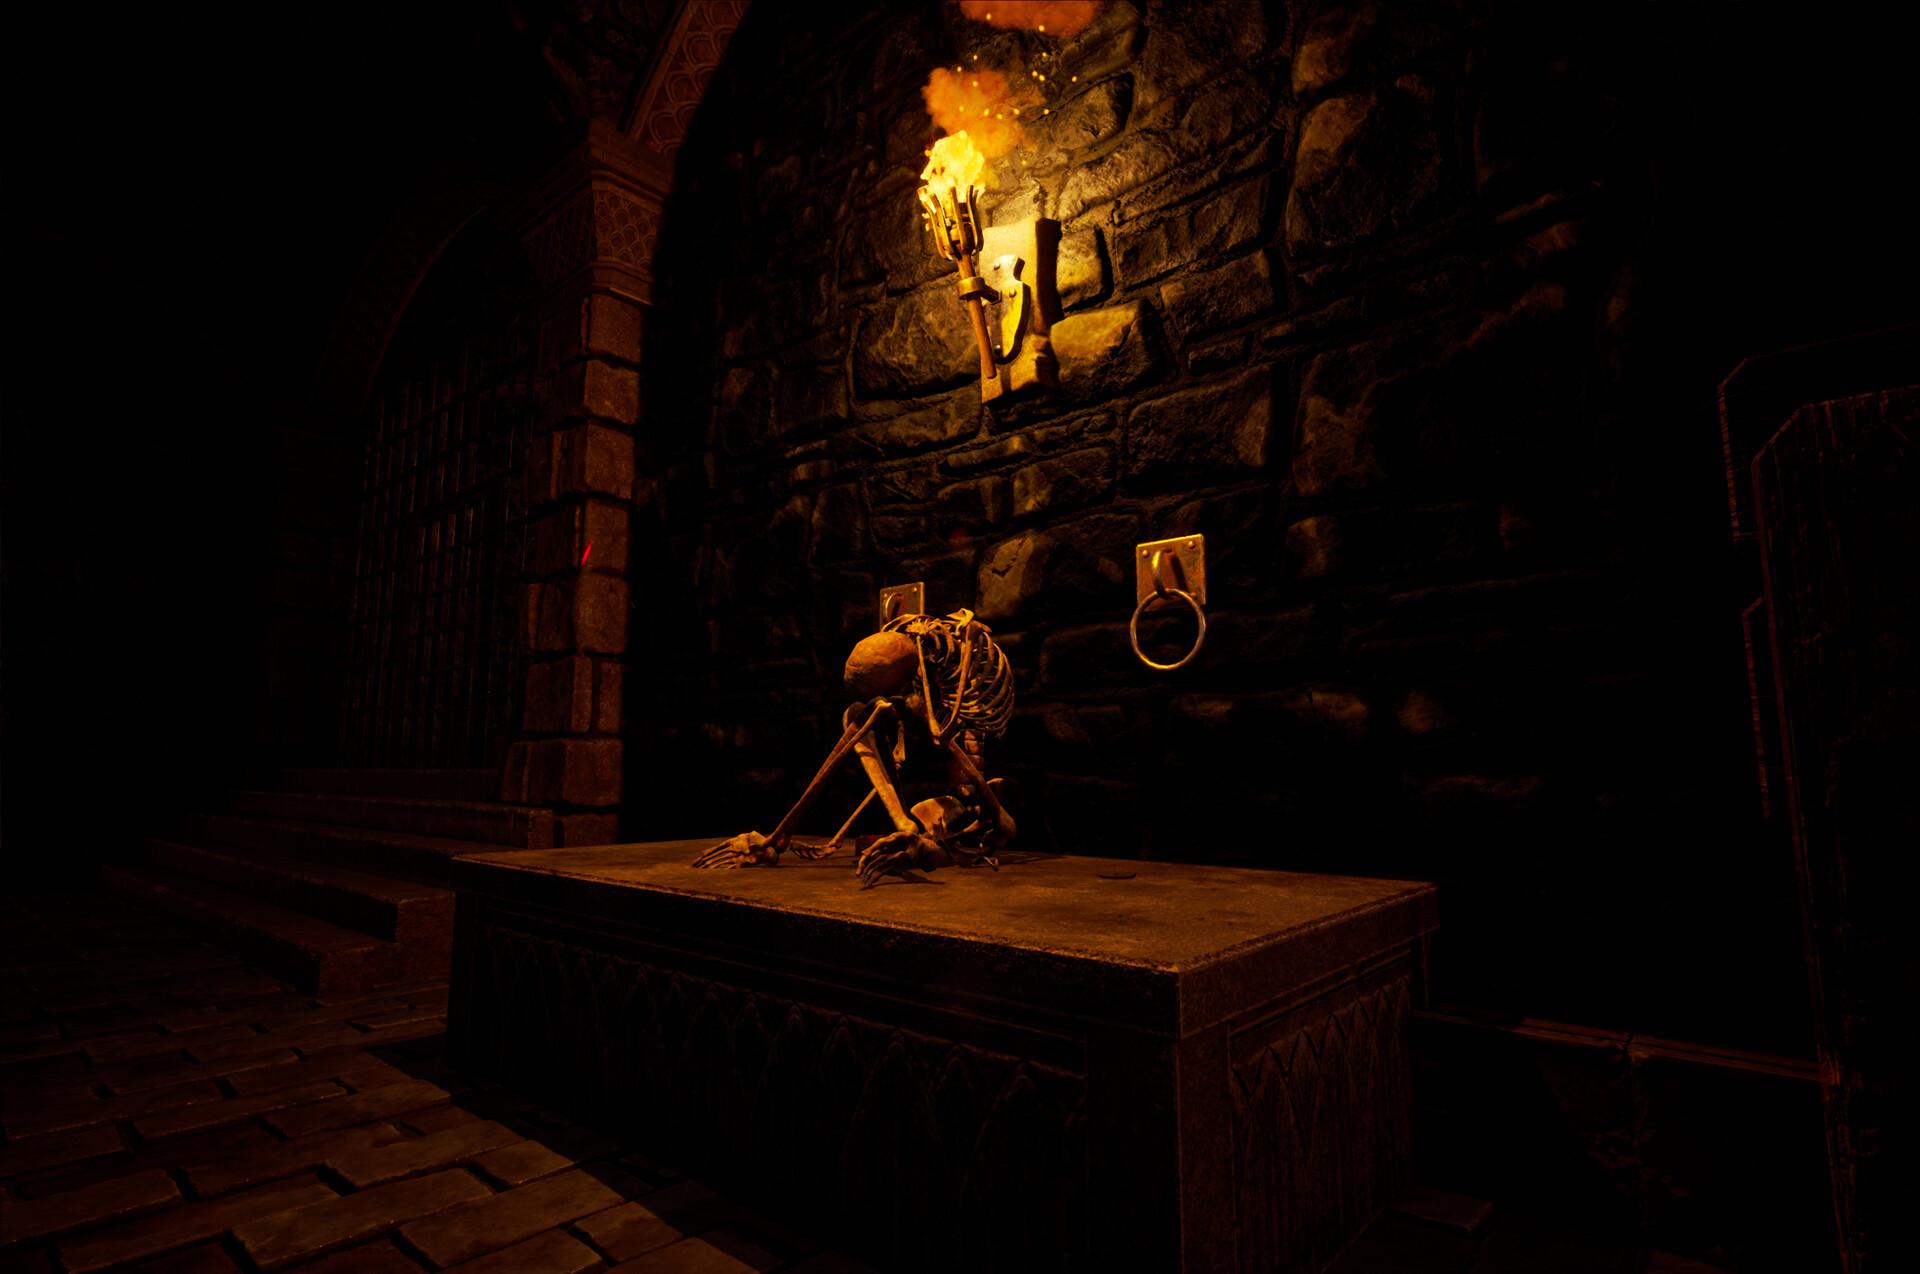 ArtStation - Medieval Dungeon - Unreal Engine 4, Ghost Design